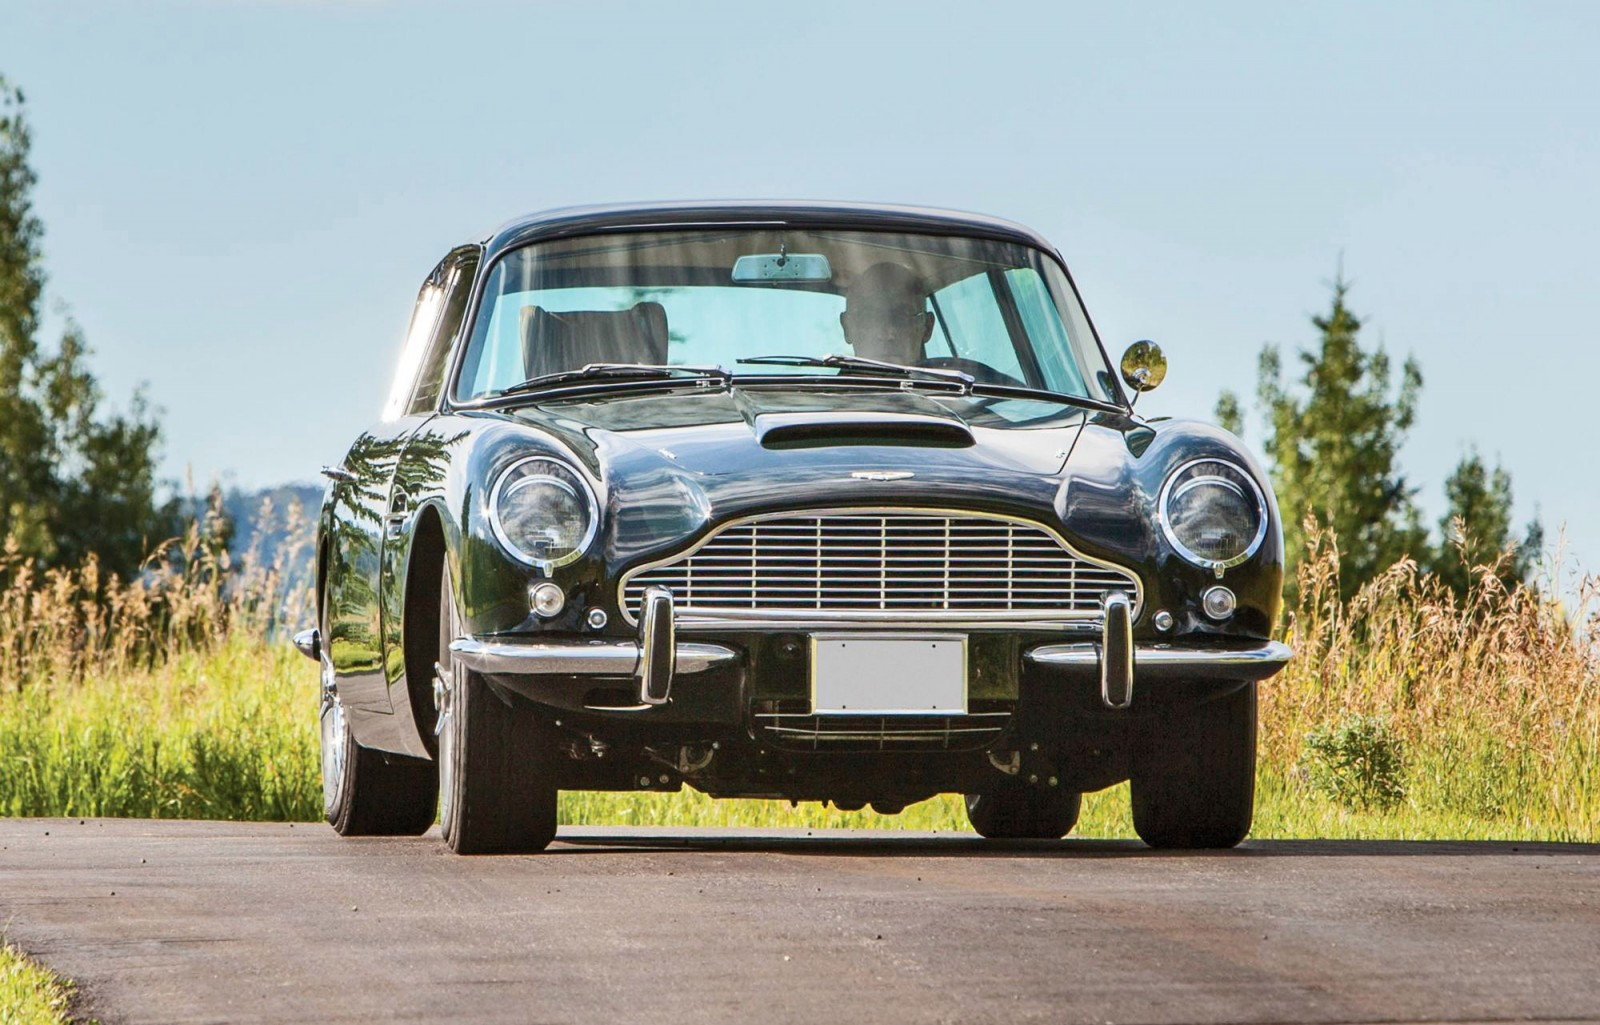 Pch Dream Car >> 1967 Aston Martin DB6 Mk I Shooting Brake by Radford